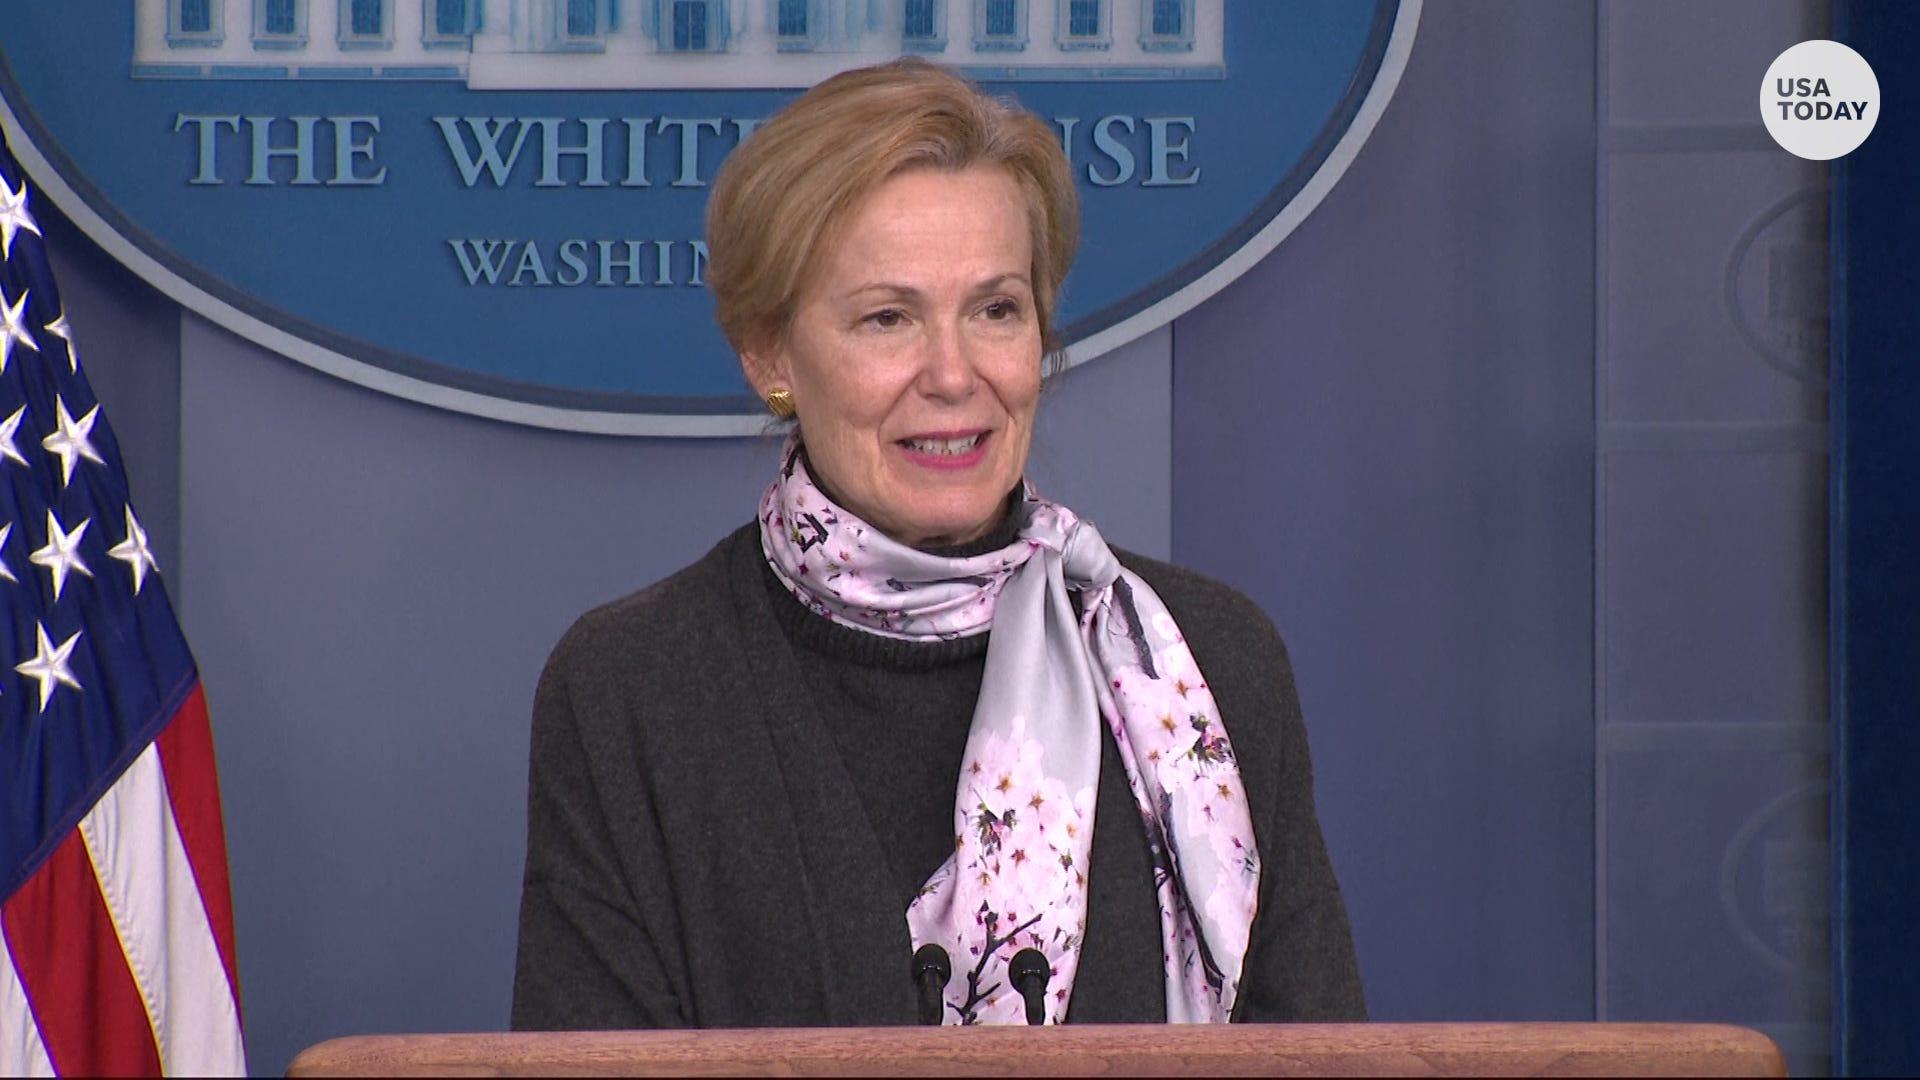 Deborah Birx slammed by both Trump, Pelosi in her role as White House coronavirus coordinator